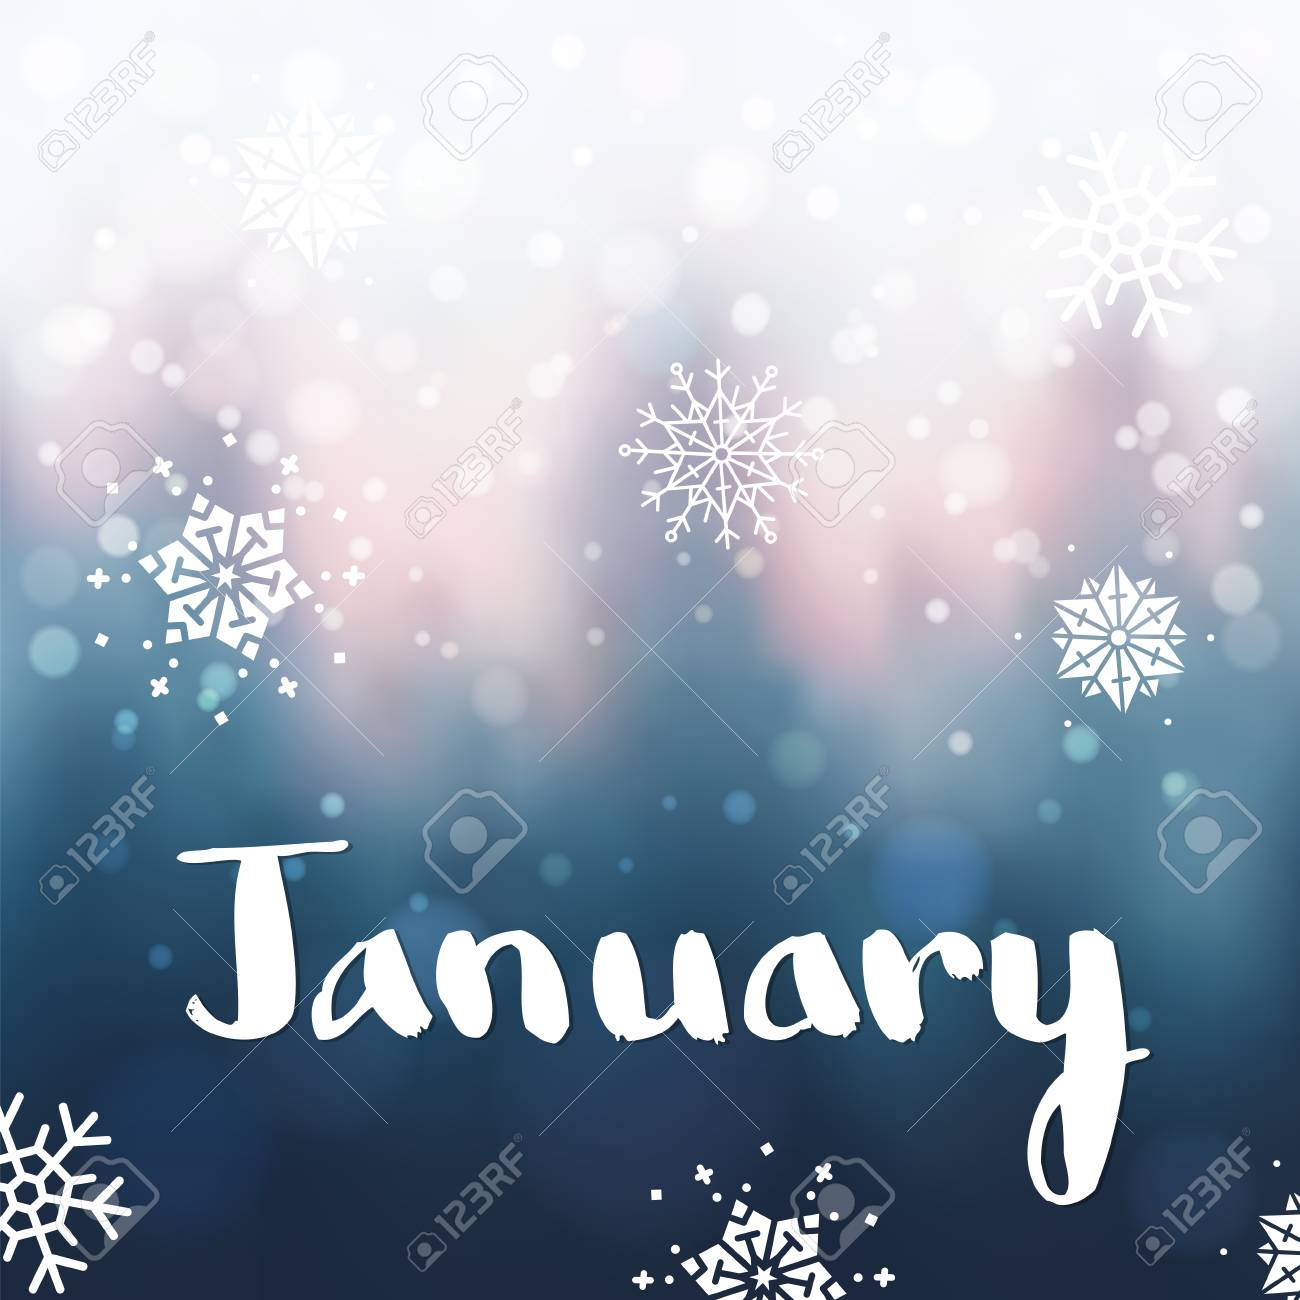 January letterig by brush on blue winter forest illustration. - 88965819